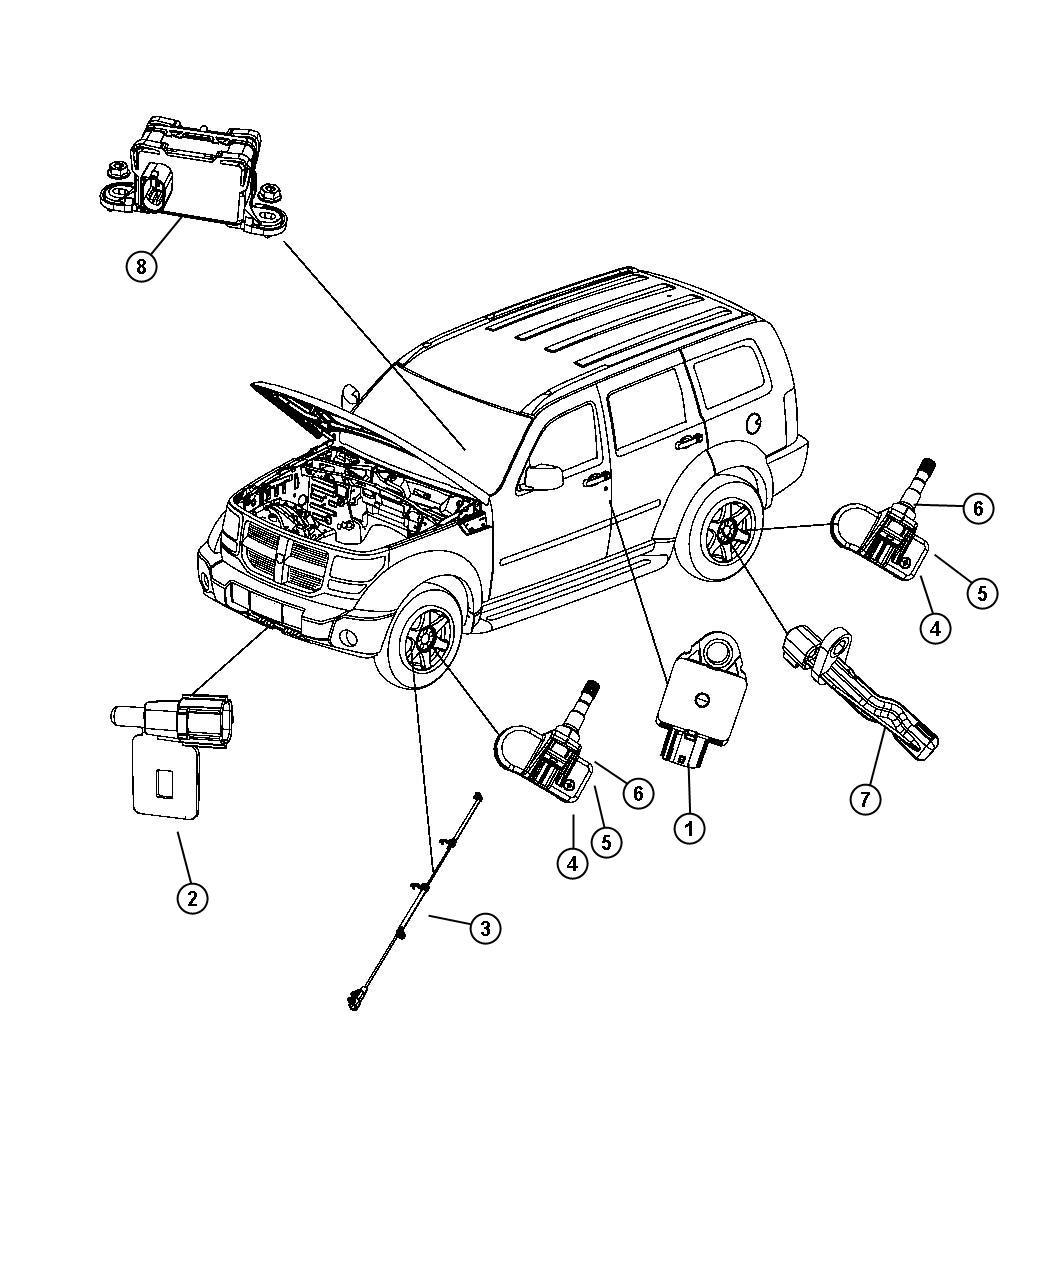 Where Is The Dymanics Sensor In A Dodge Nitro